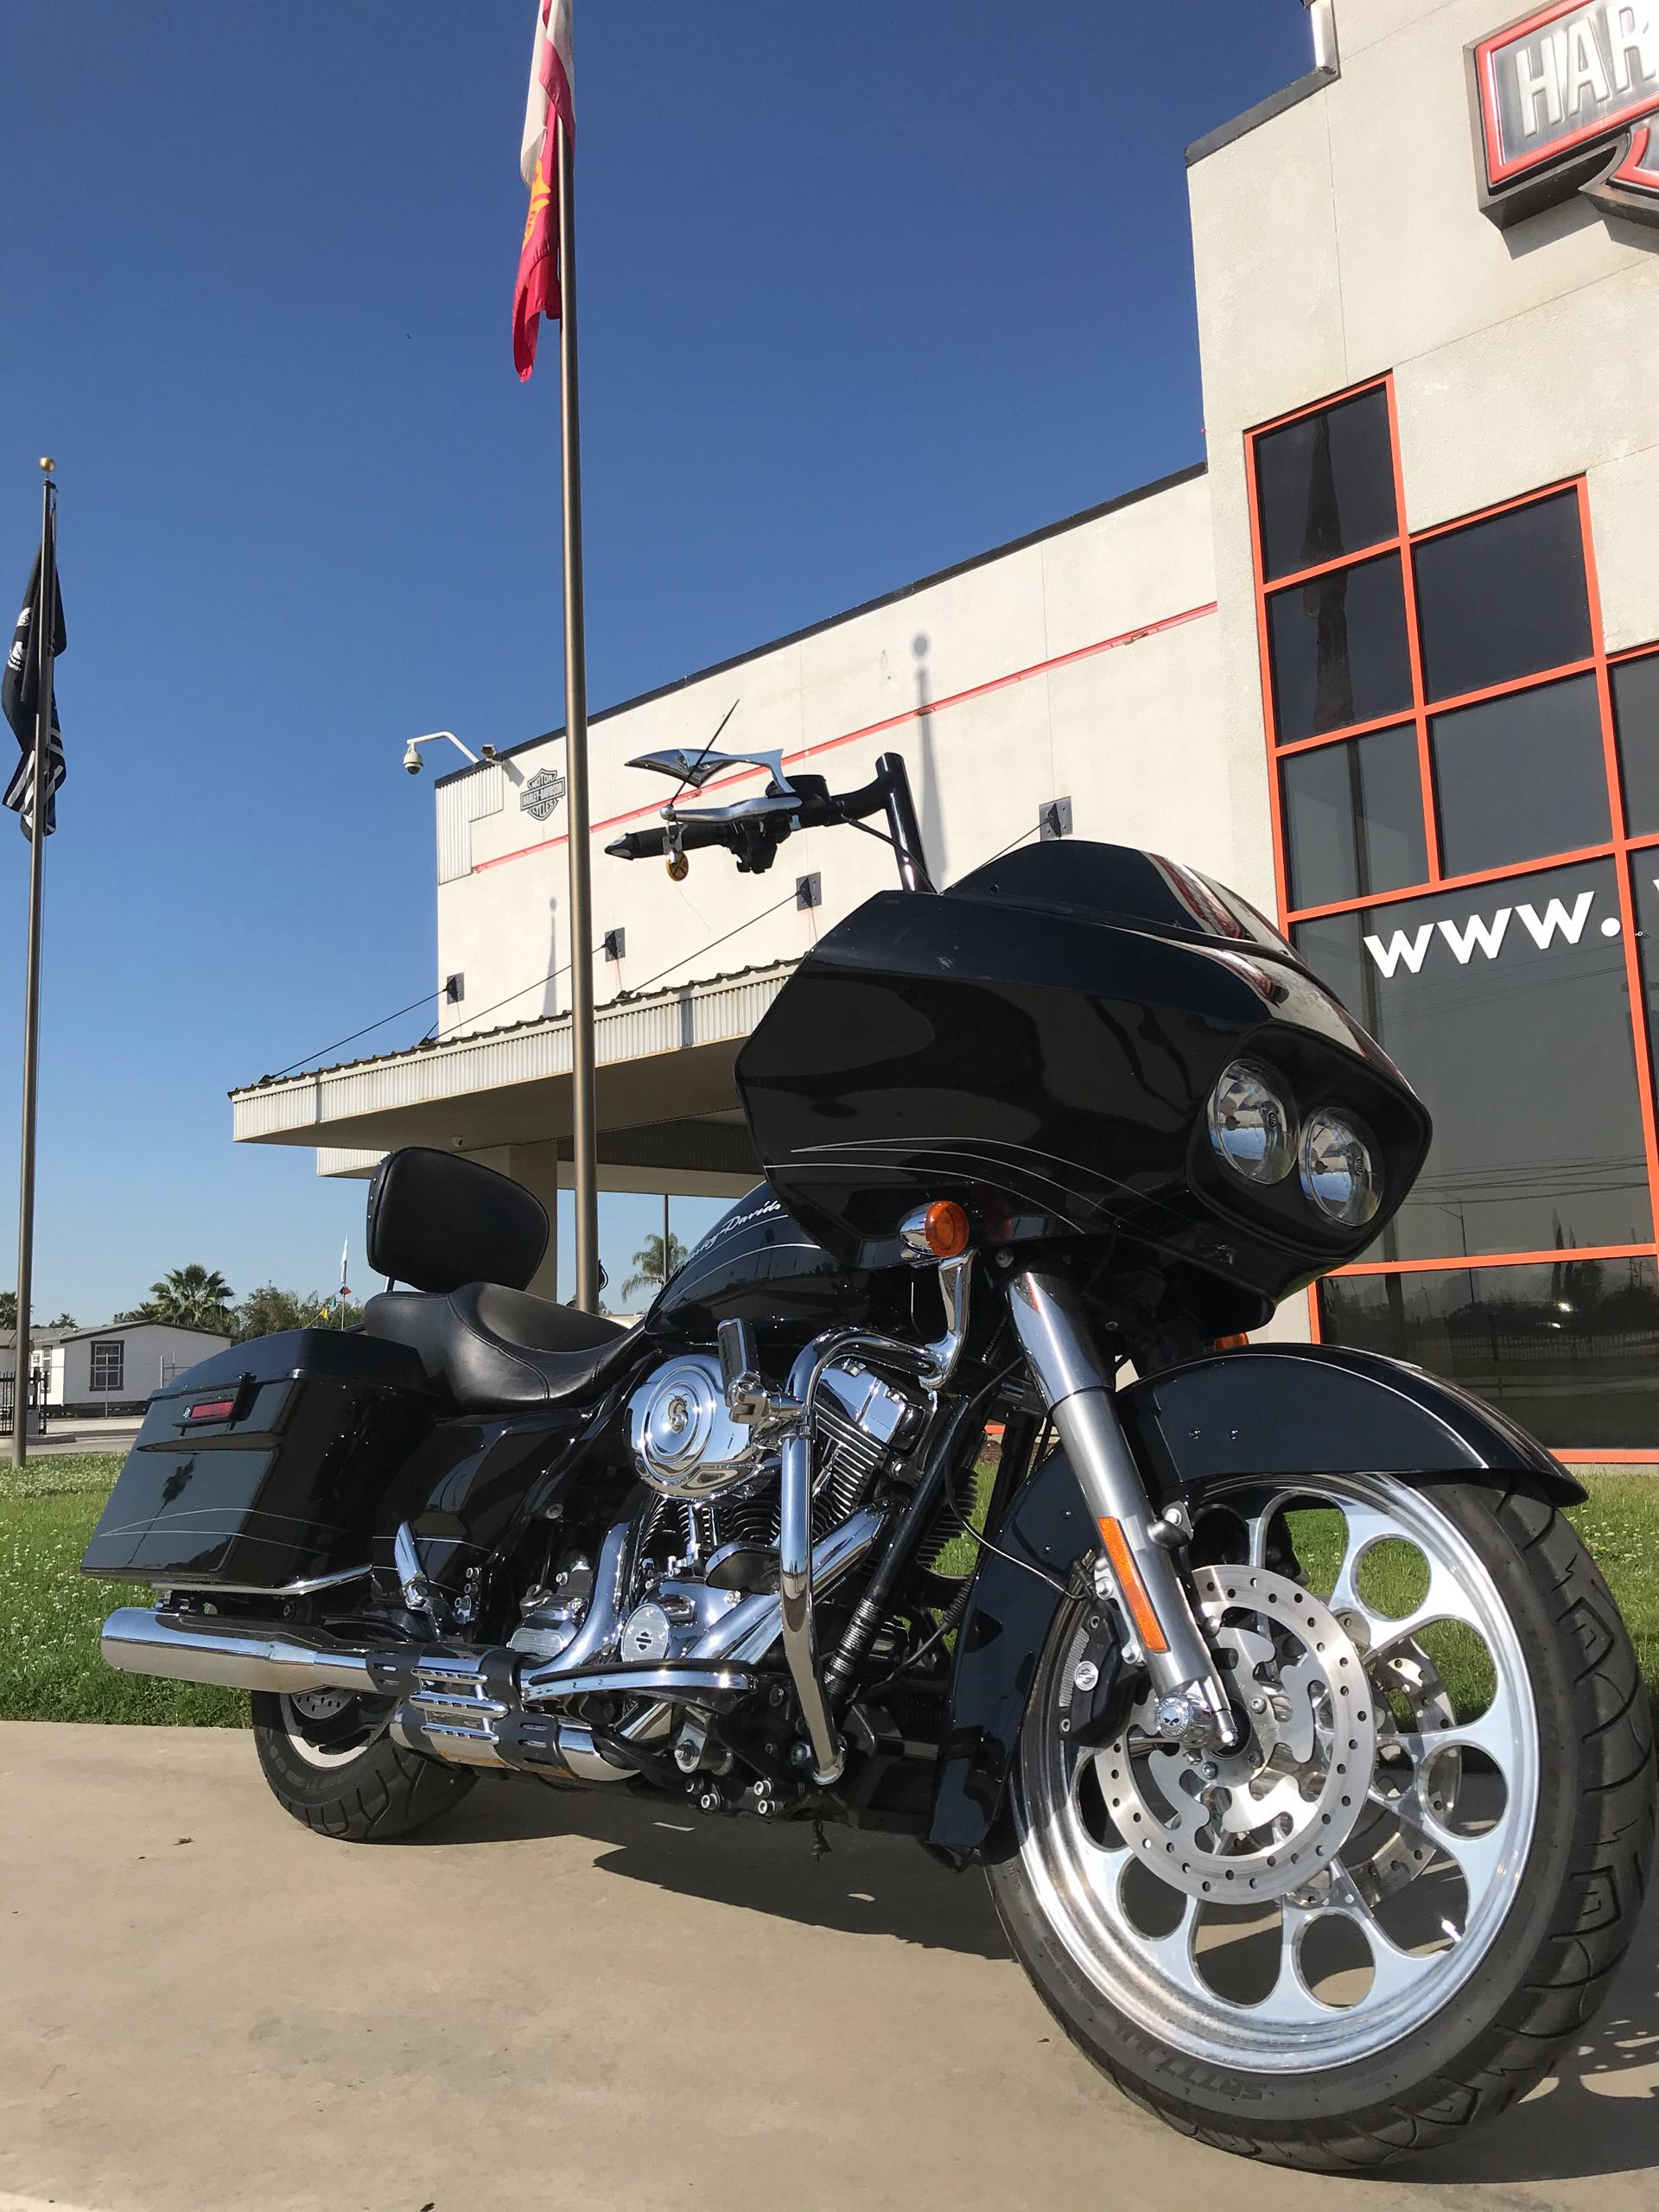 2012 Harley-Davidson Road Glide Custom at Visalia Harley-Davidson